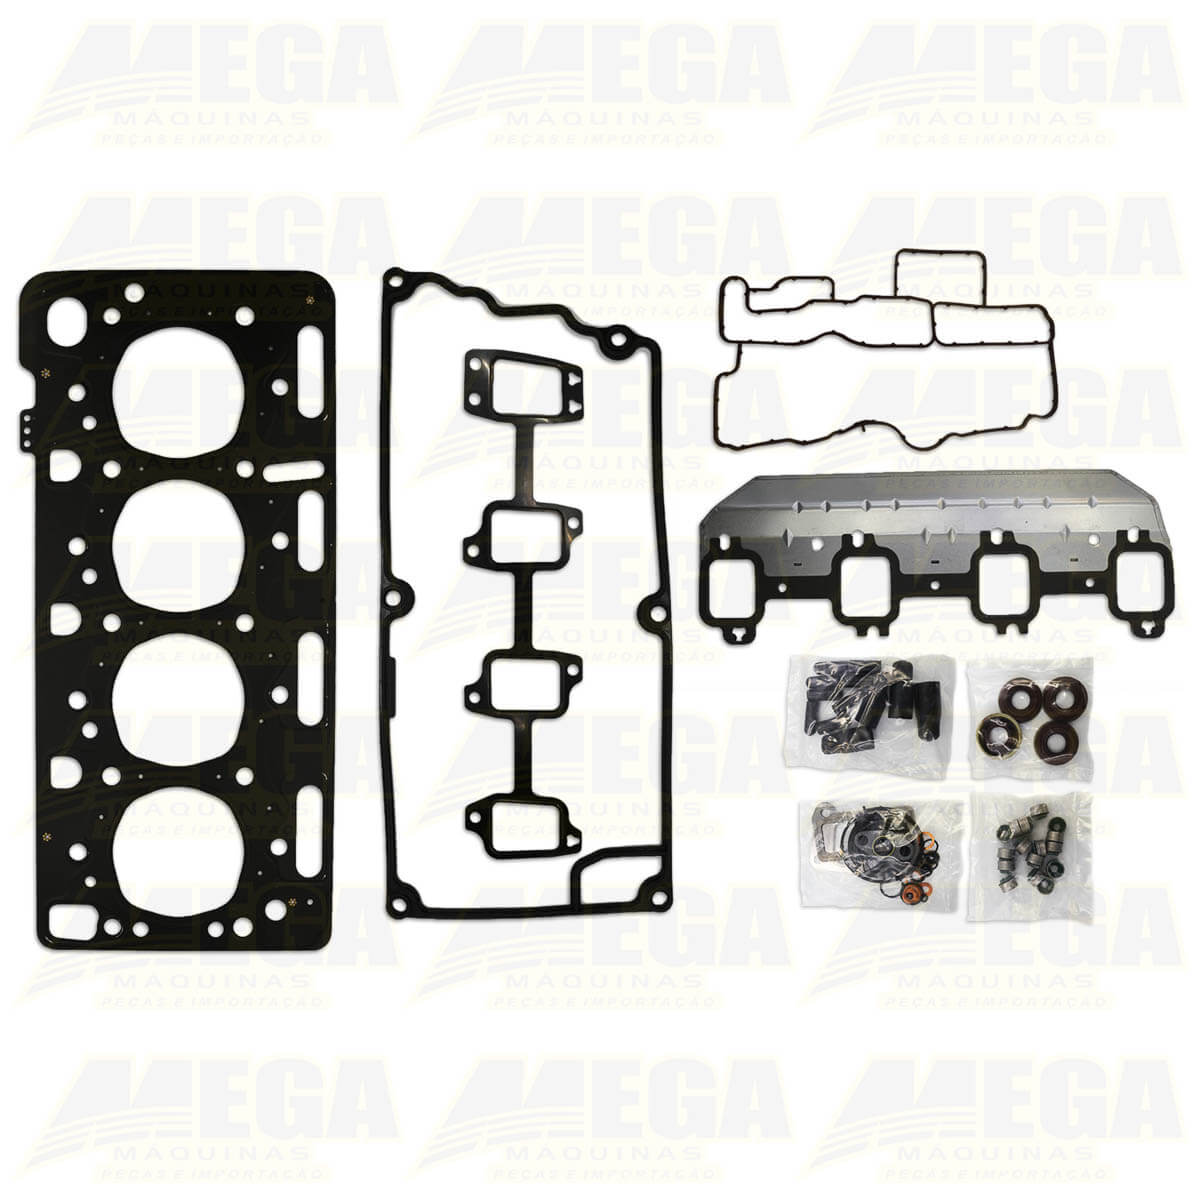 Jogo de Juntas Superior Turbinado Motor DieselMax 444 - 320/09382